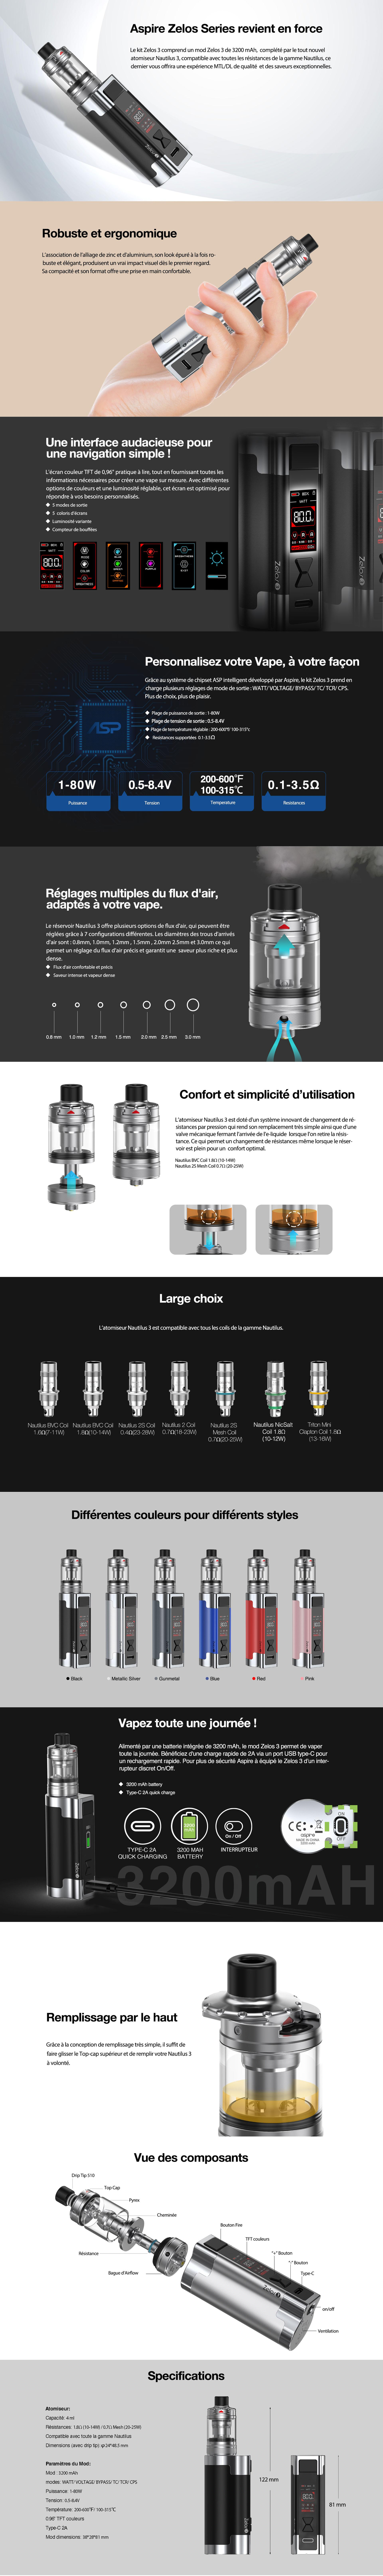 Zelos-3-Kit-website-page-2.jpg